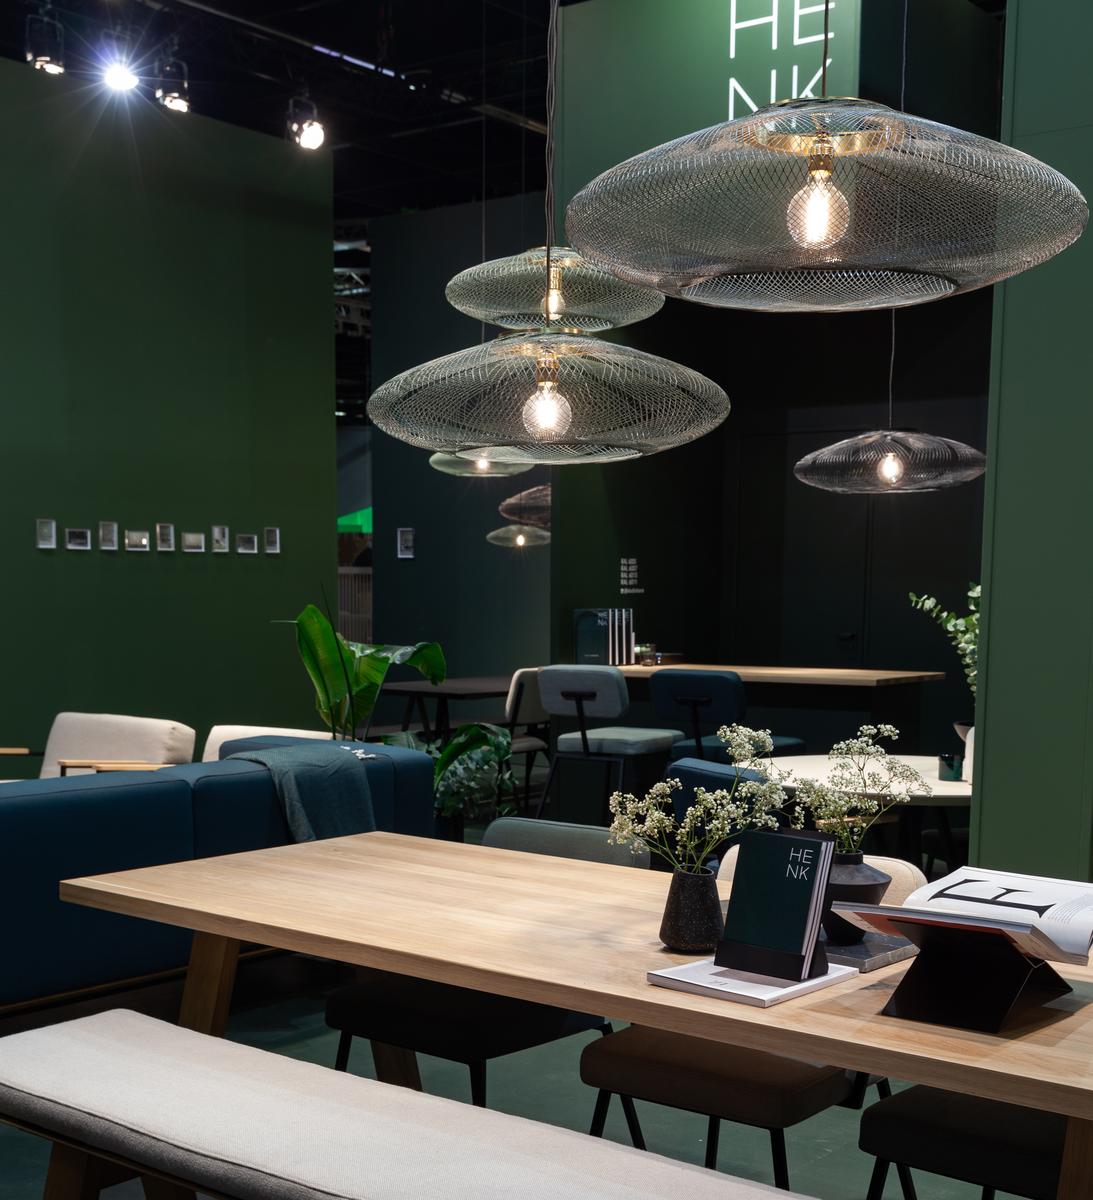 Atelier Robotiq Ufo Lamp Pendant Mos Groen Green Exclusieve Design Lamp